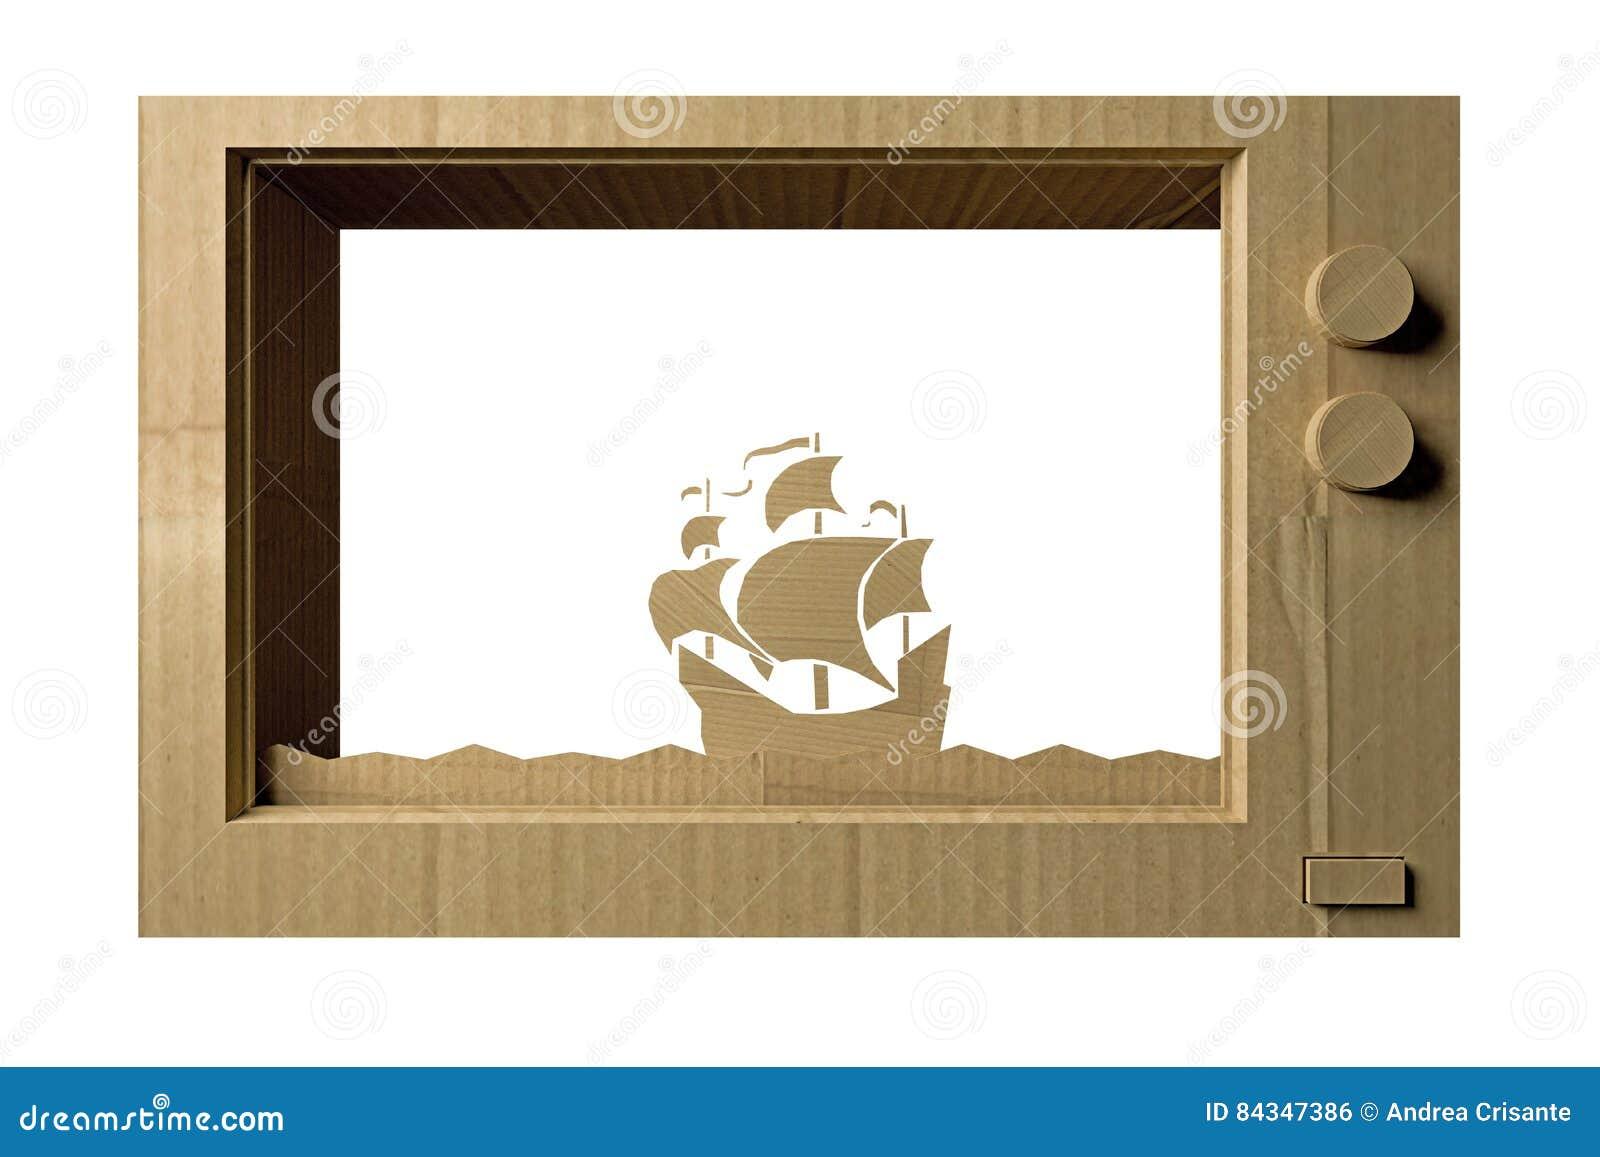 Cardboard tv stock illustration. Illustration of channel - 84347386